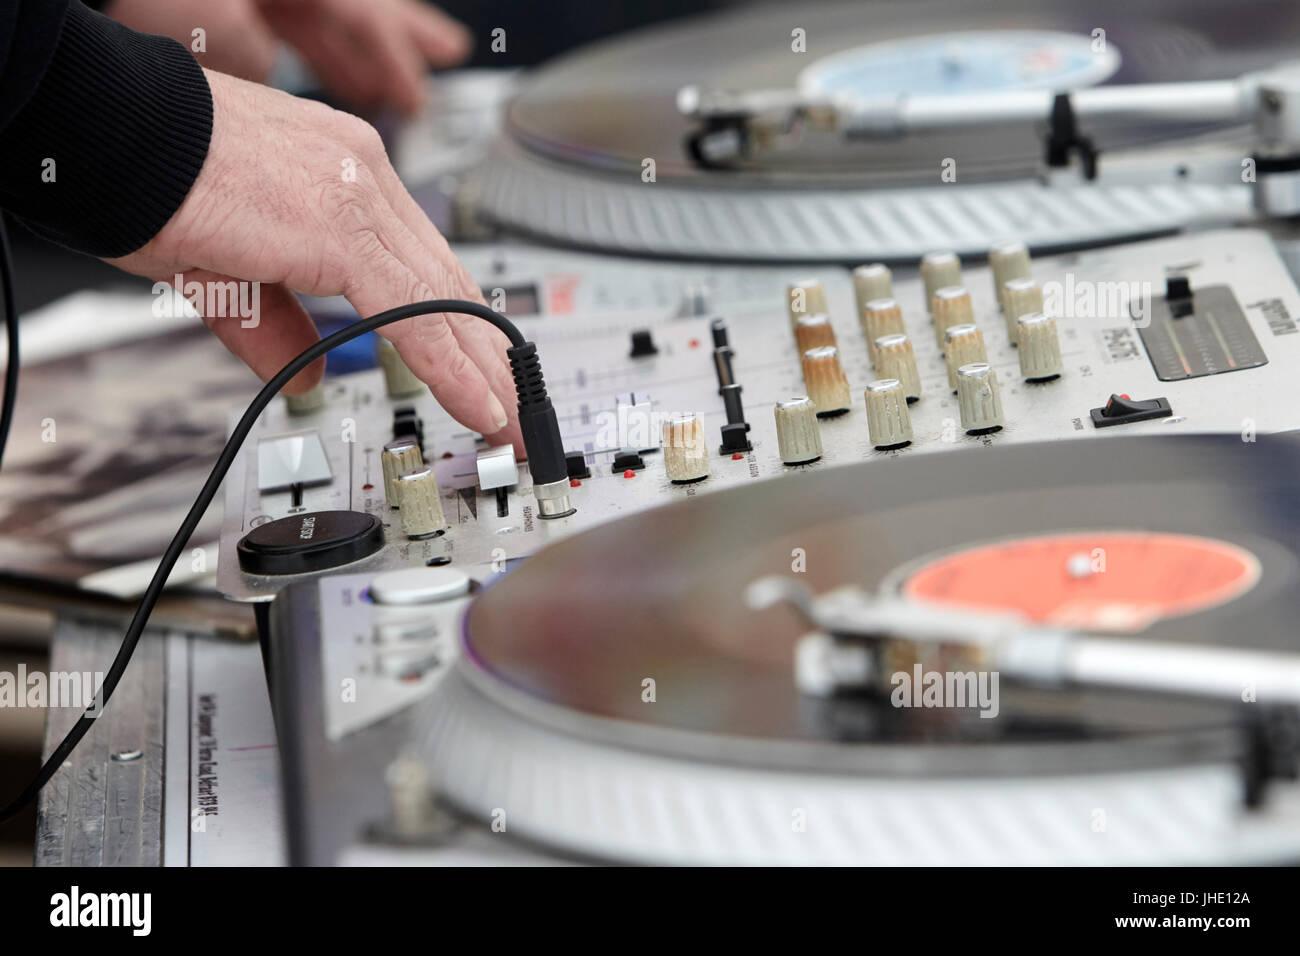 dj mixing lp vinyl records - Stock Image